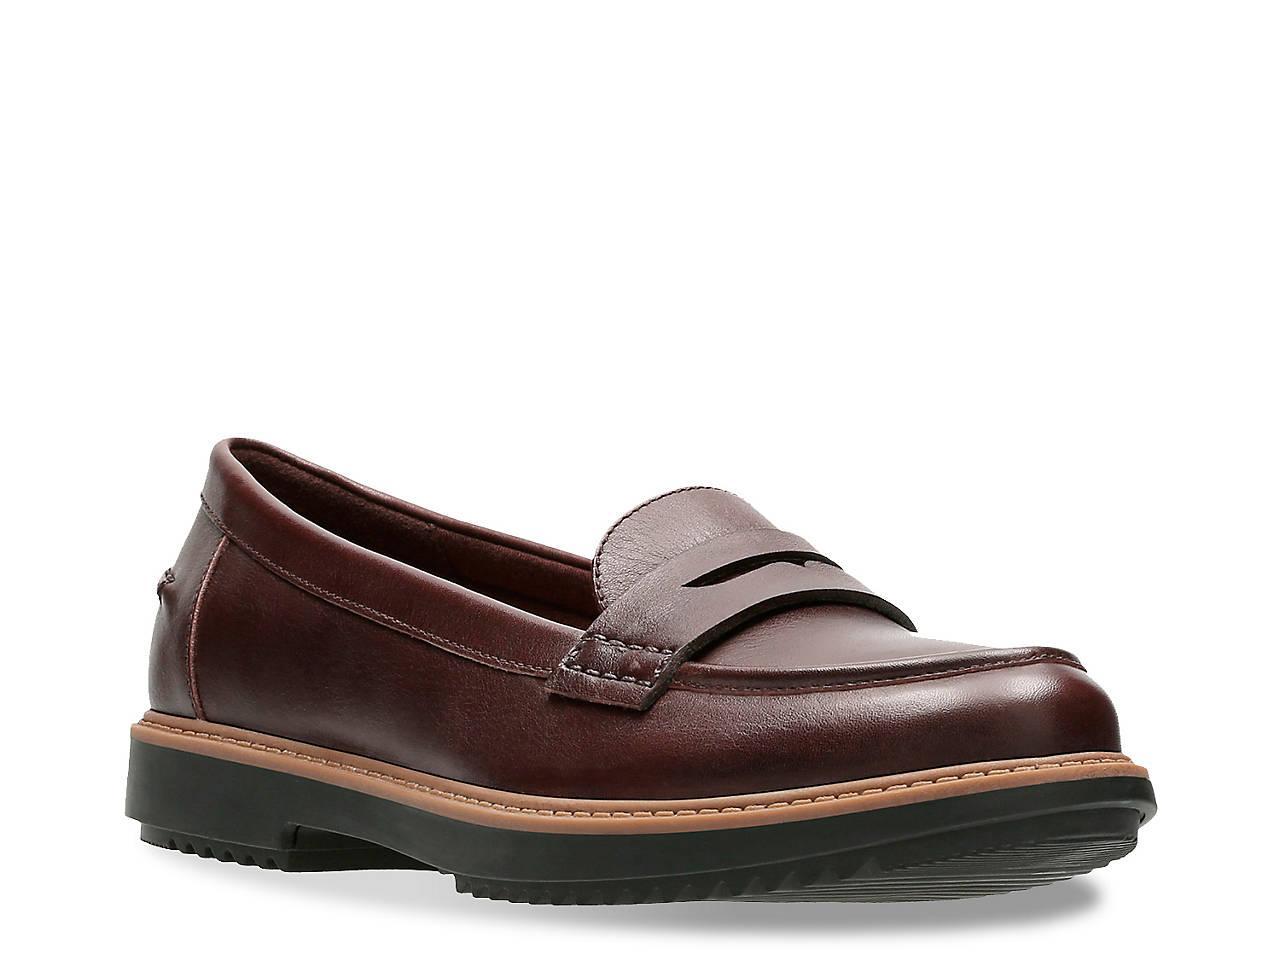 5c95f9ca006 Clarks Raisie Eletta Penny Loafer Women s Shoes